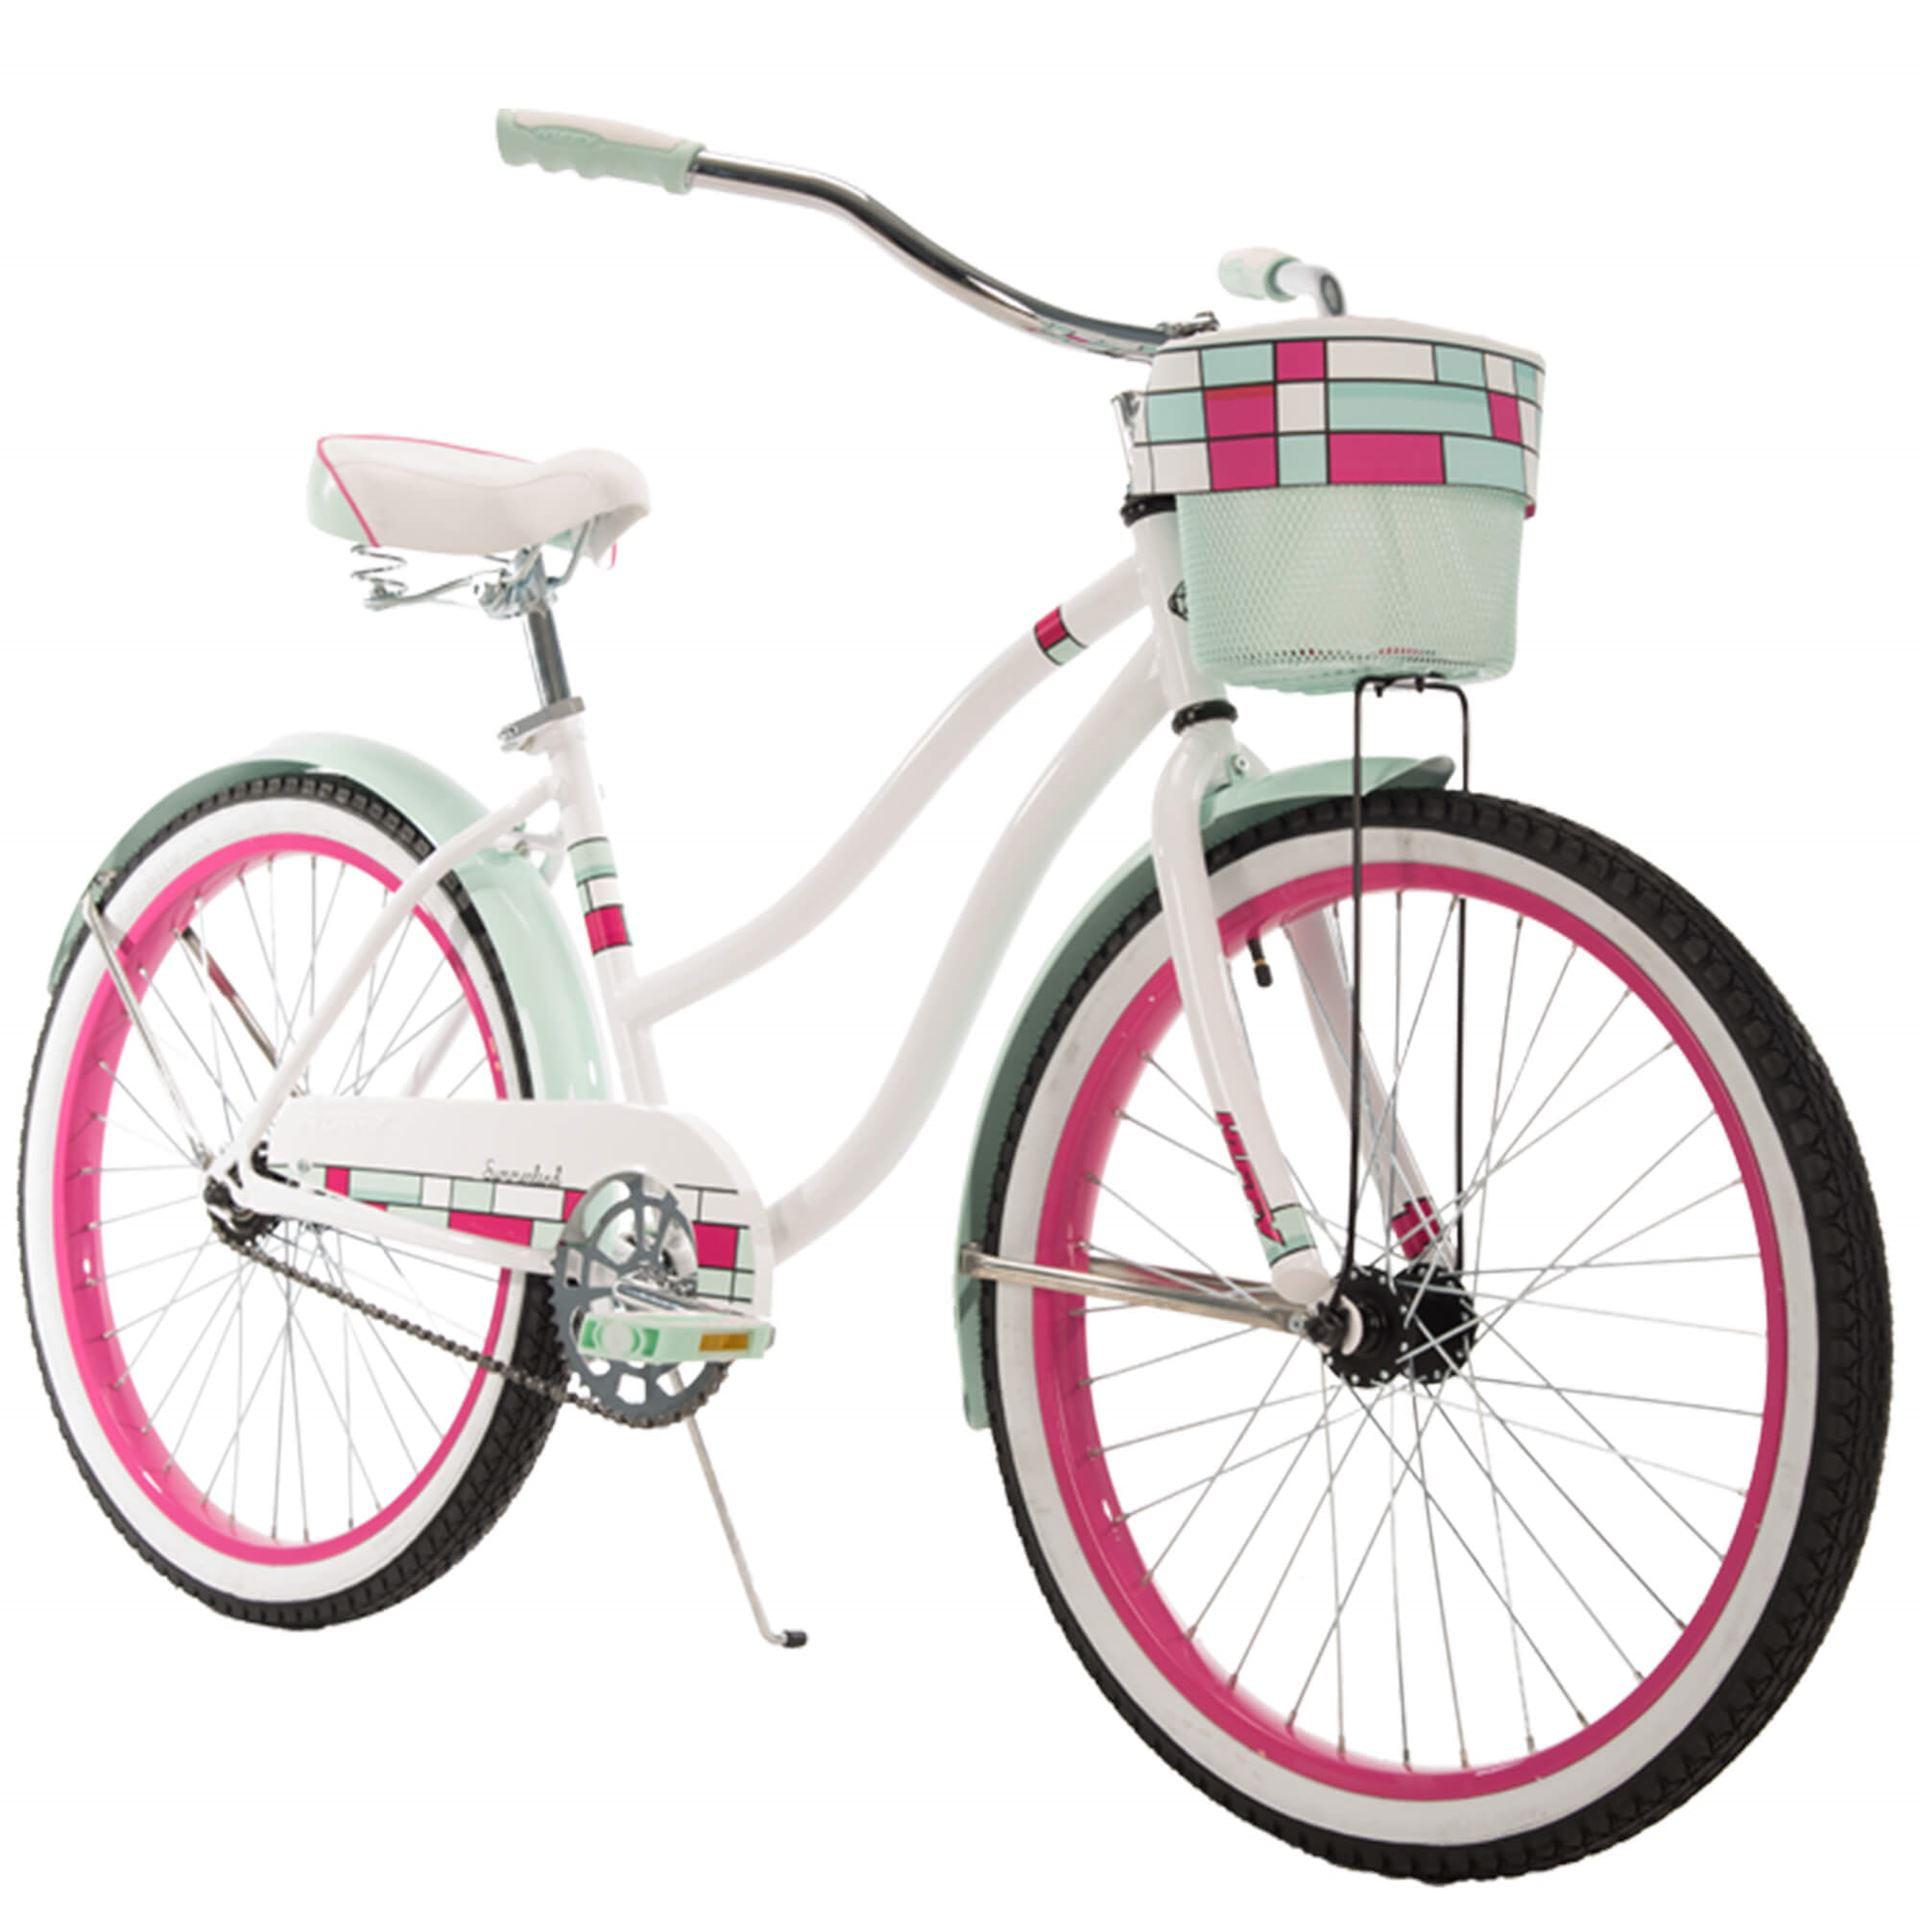 "Huffy 24"" Summerland Girls' Cruiser Bike, Hot Pink and Sky Blue by Huffy"